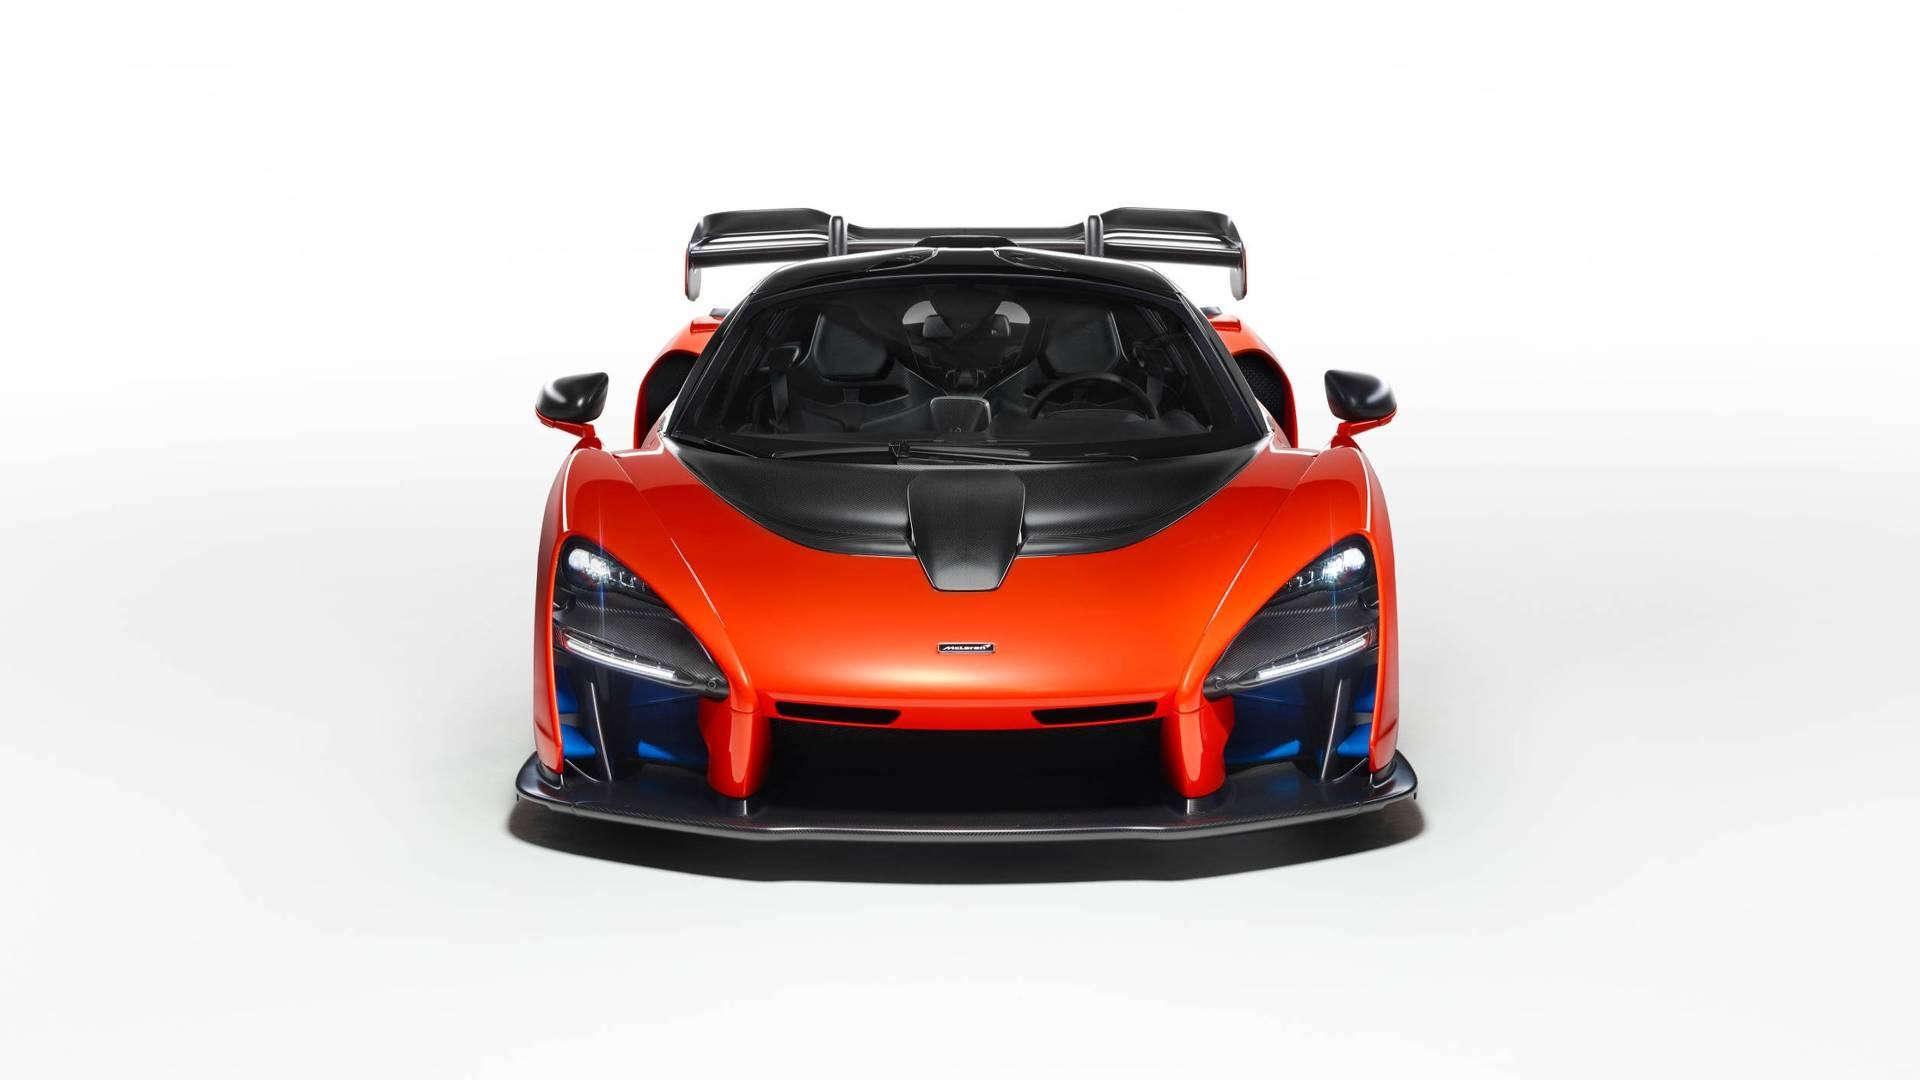 Orange Race Car >> McLaren Senna Specifications Will Leave You Speechless - autoevolution